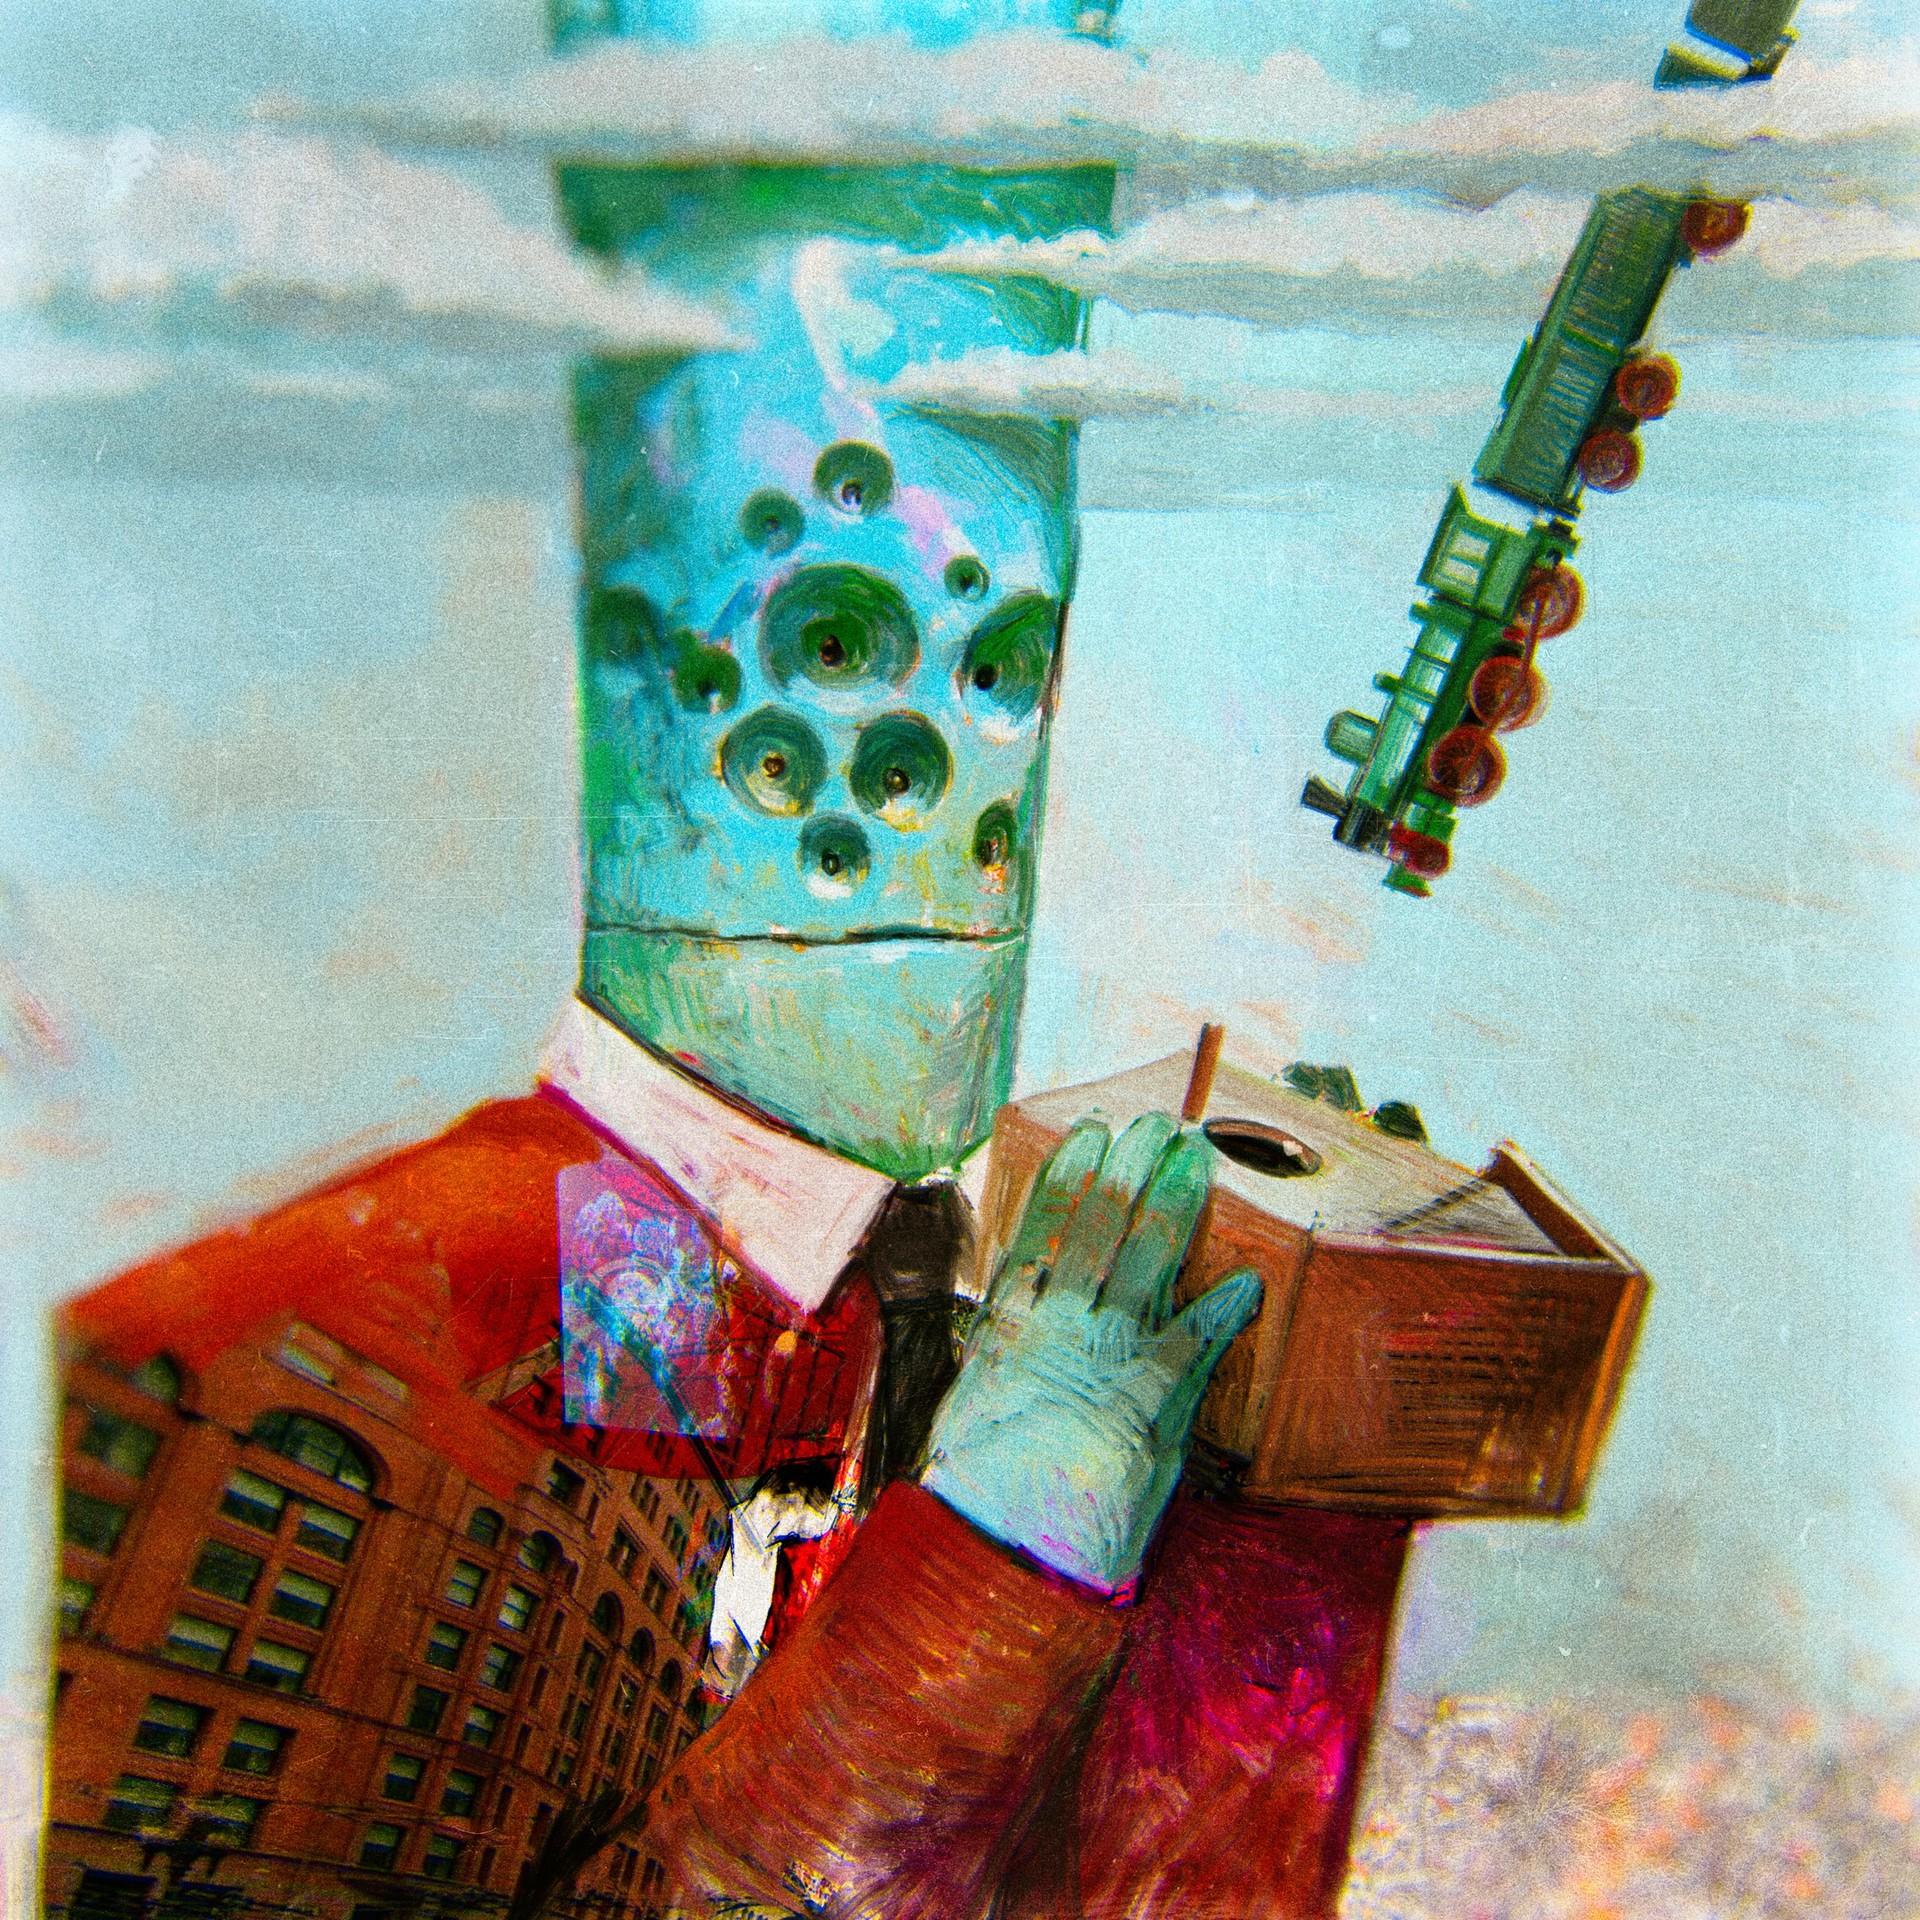 [Reflexion] Les oeuvres qui vous inspirent Eugene-korolev-kj0wixxtpek